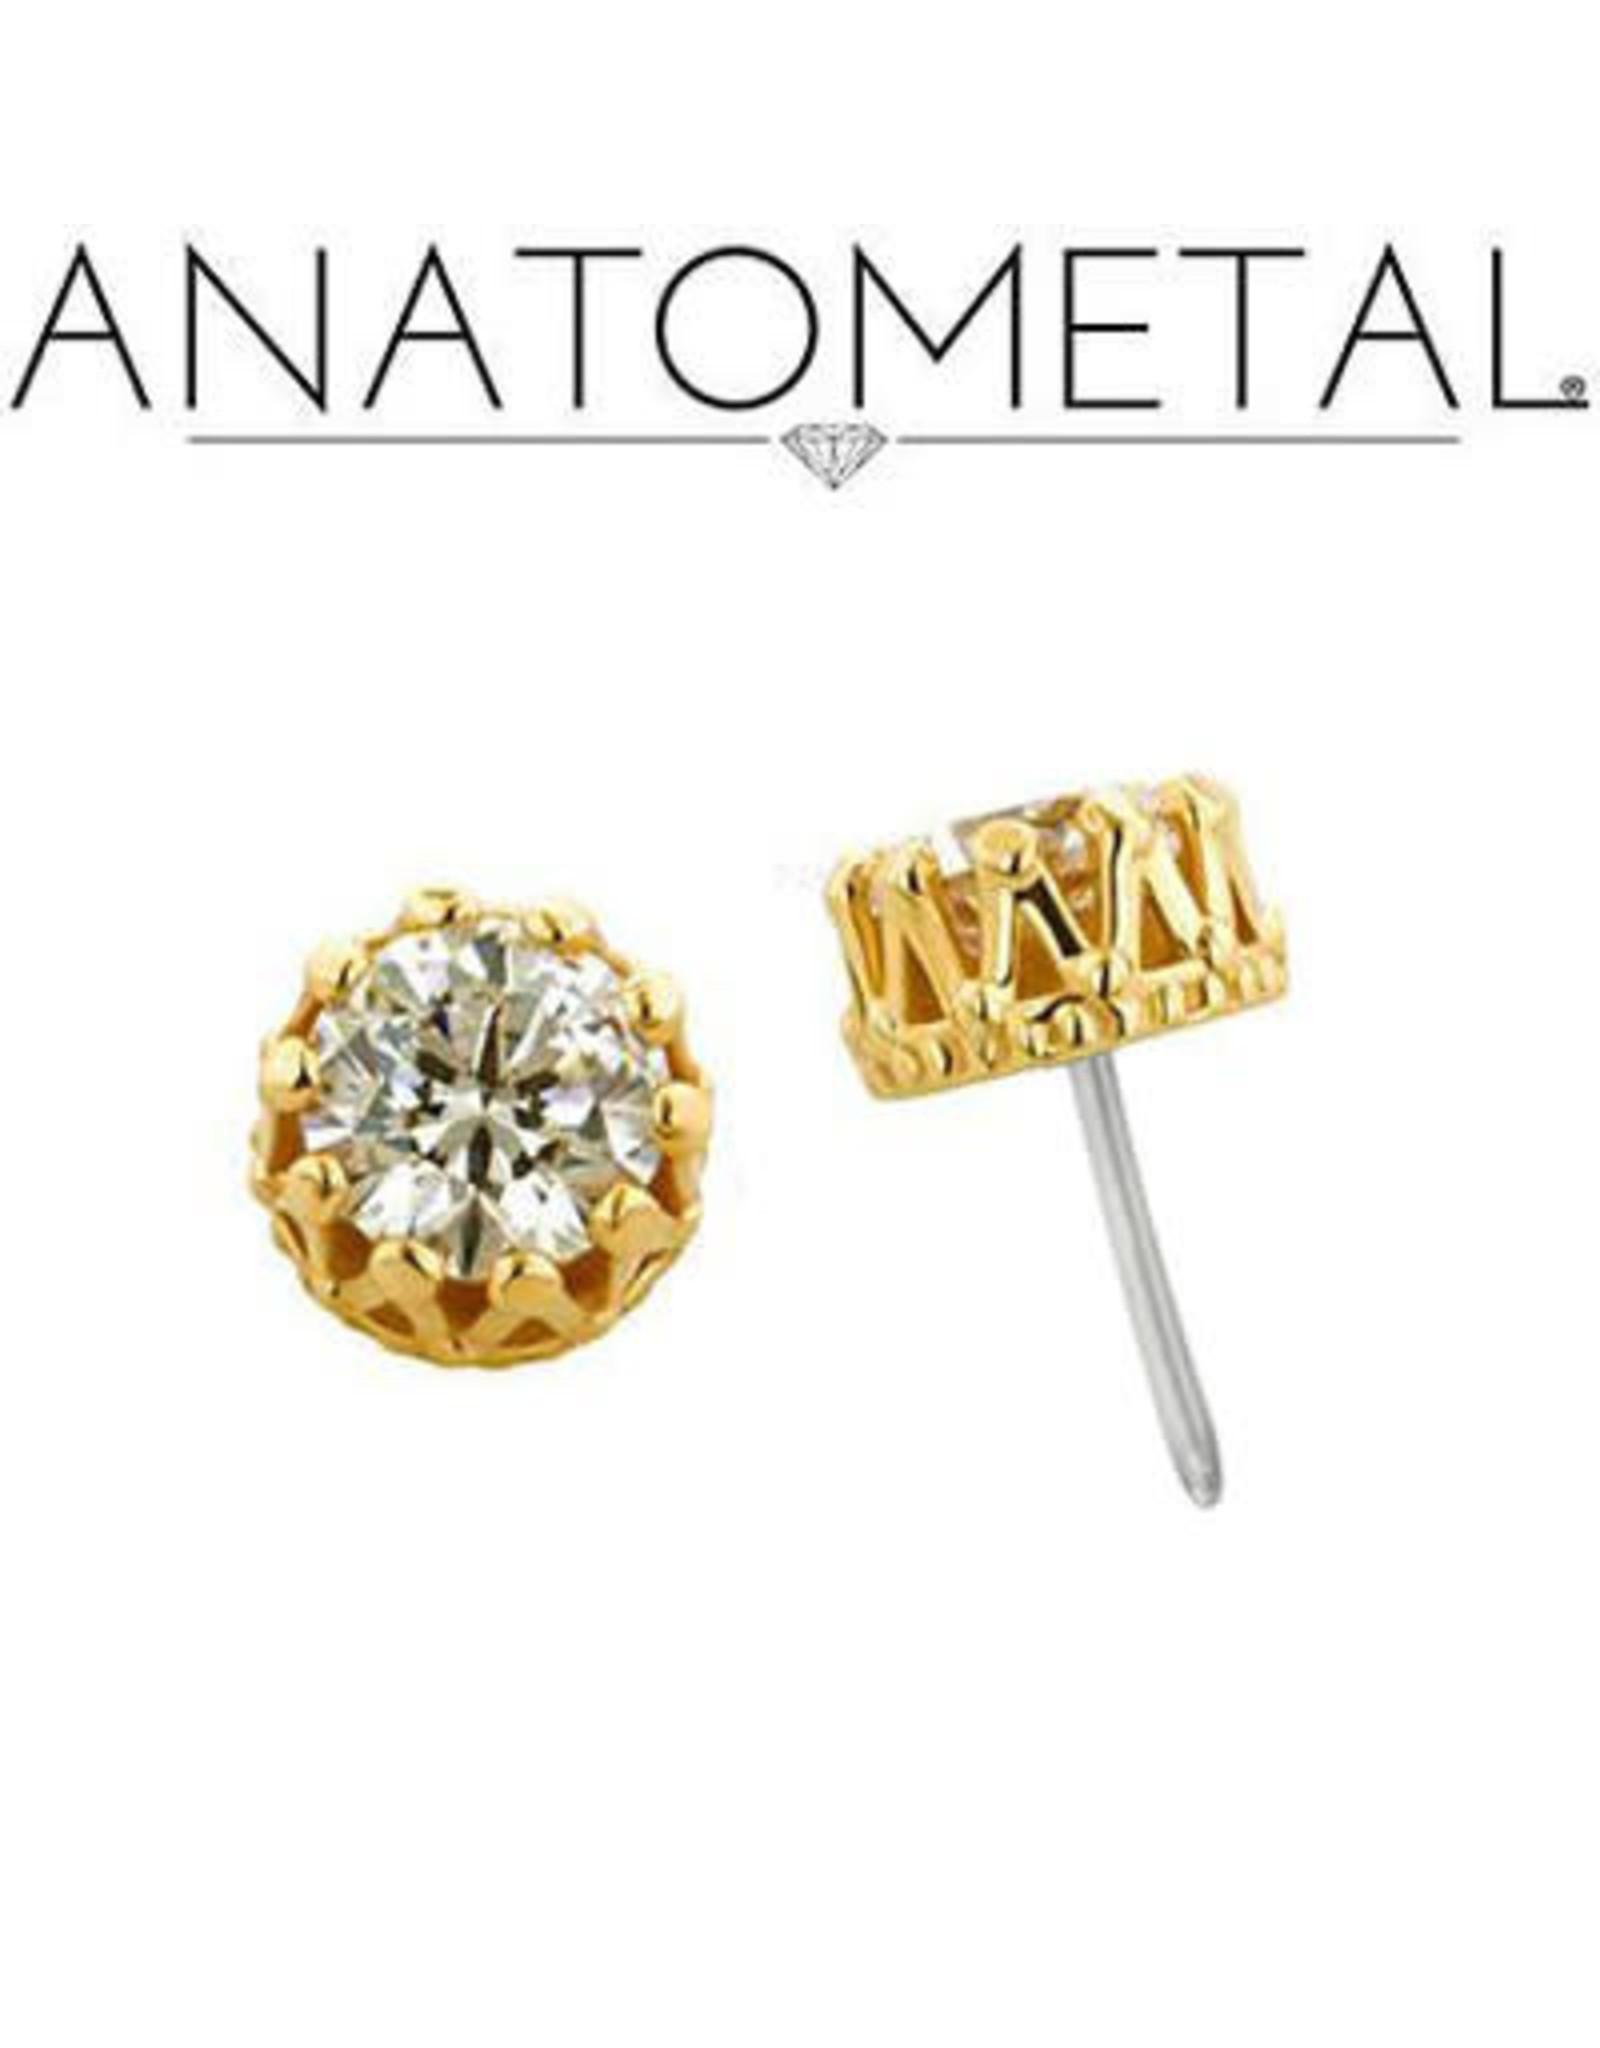 "Anatometal Anatometal gold ""King"" press-fit end with crown-set 4.0 gemstone"